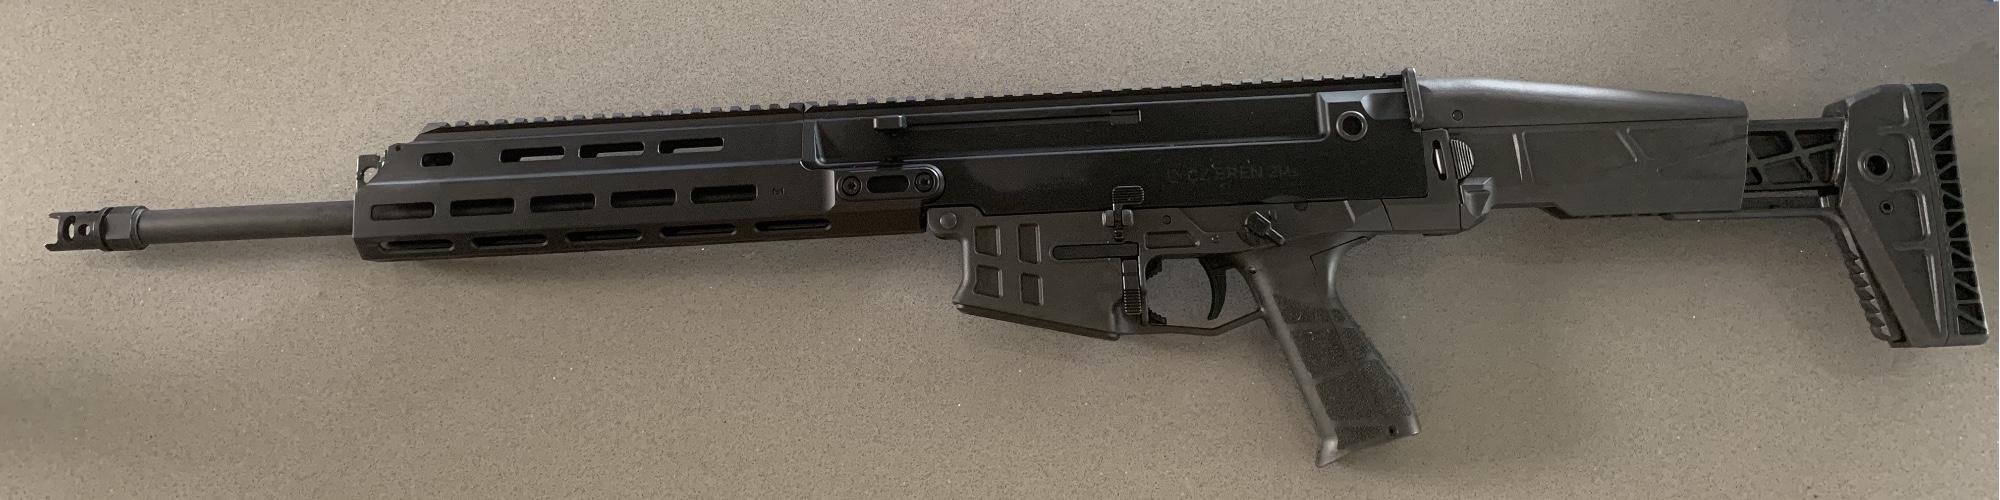 CZ Bren MS2